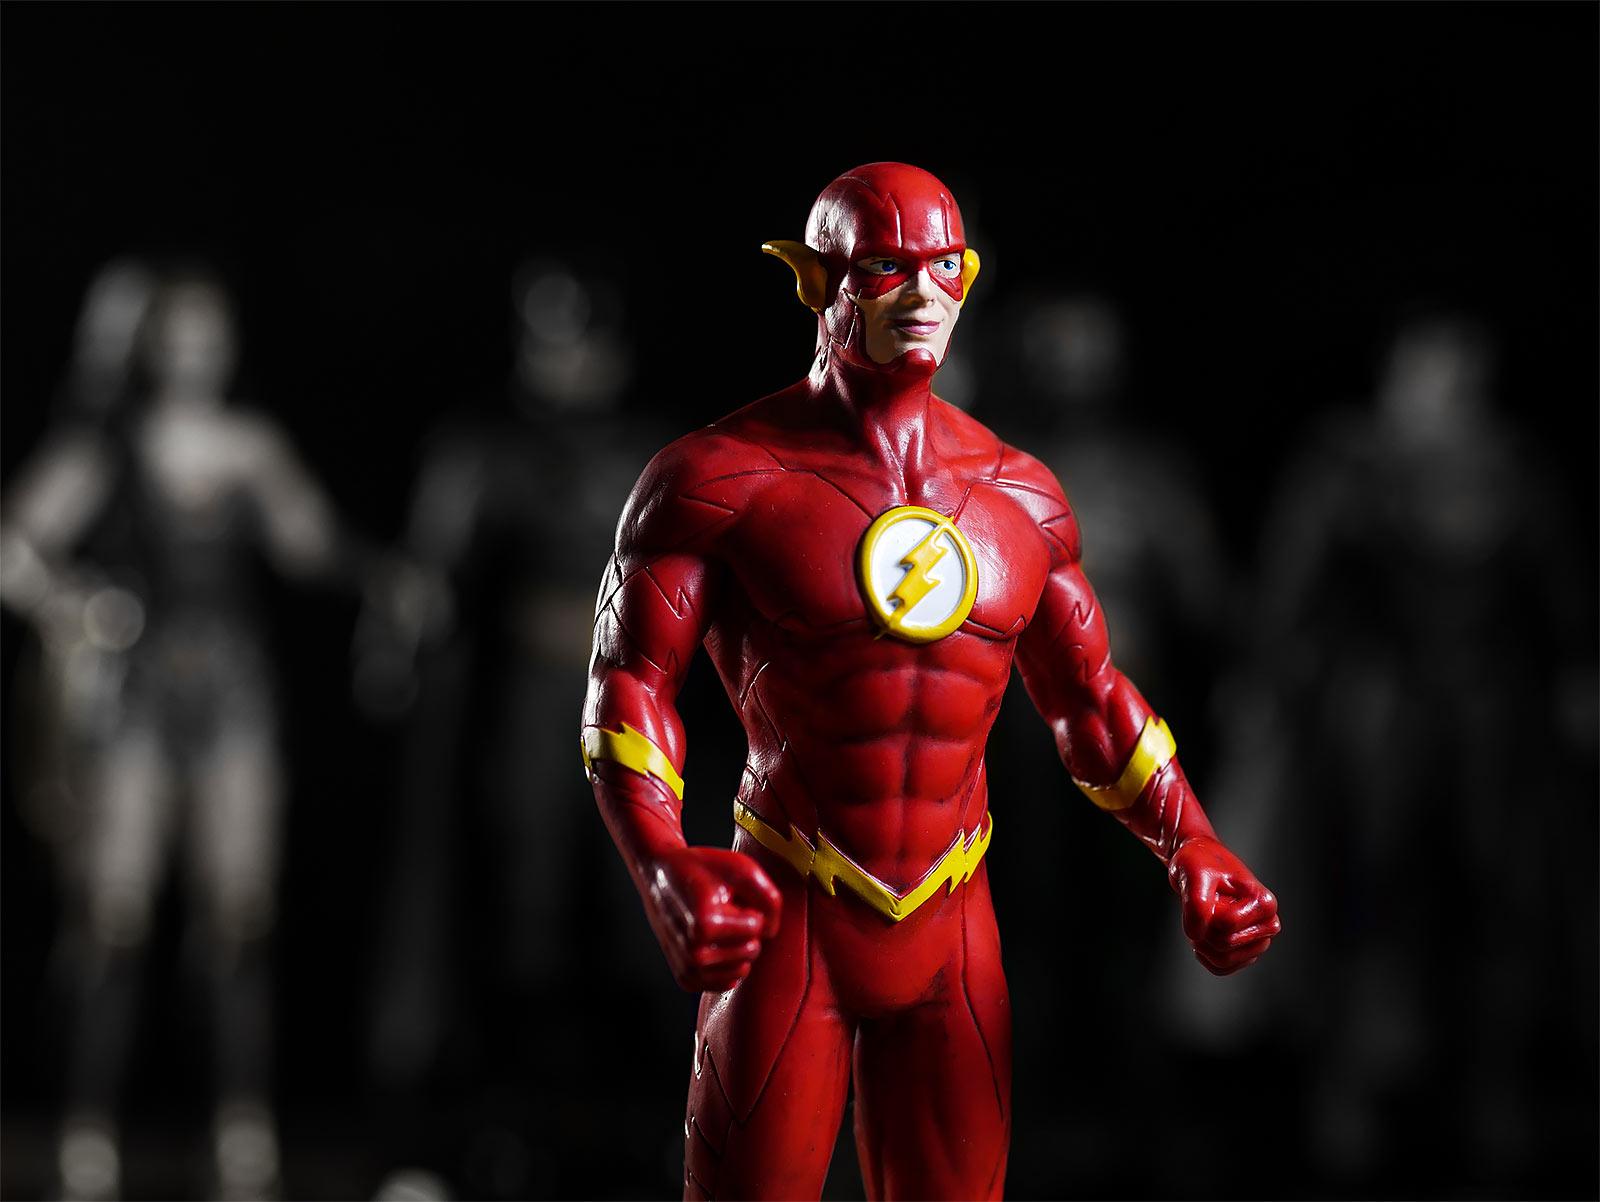 DC Comics - Flash Bendyfigs Figur 19 cm